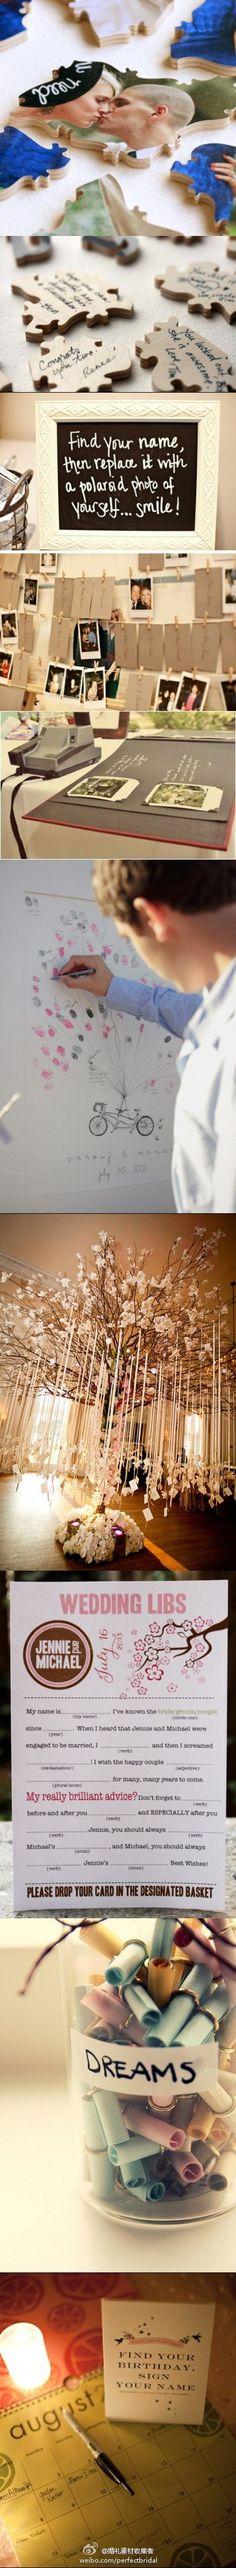 wedding sign-in ideas. pretty clever stuff.